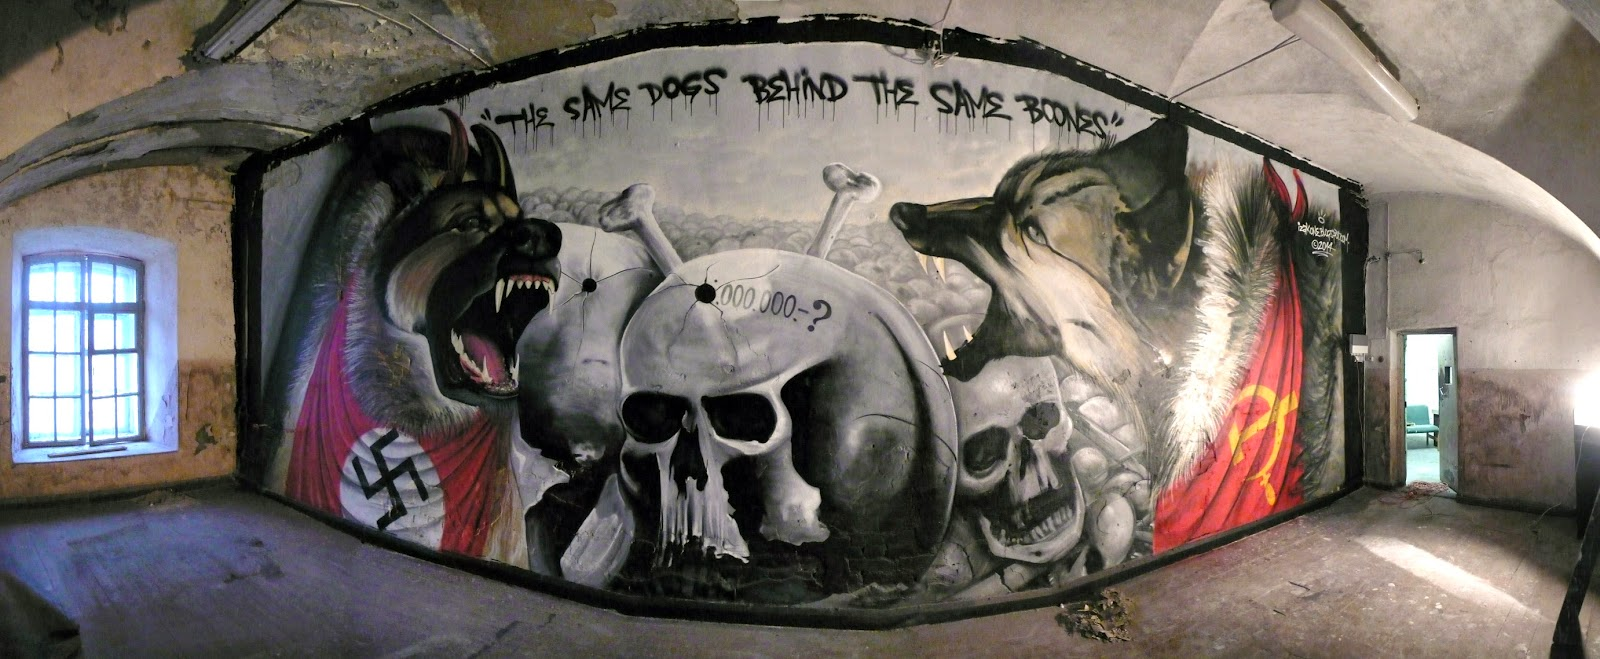 izak one, graffiti, street art, patarei graffiti, patarei vangla, chile, estonia, street art tallinn, graffiti estonia